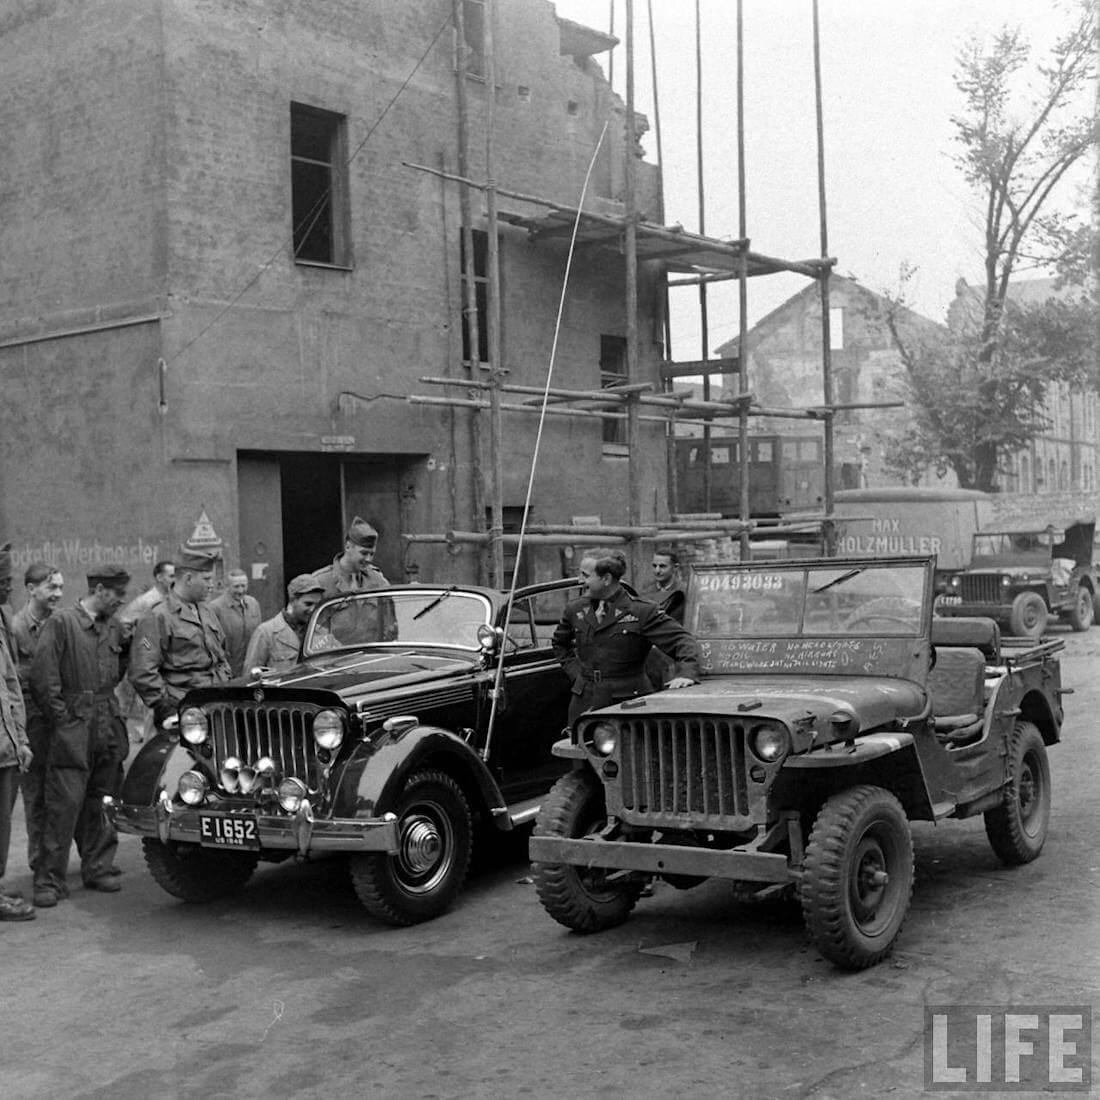 Walter Chochin Jeepster ja Willys MB sotilasajoneuvo. Kuva: Walter Sanders/Life.